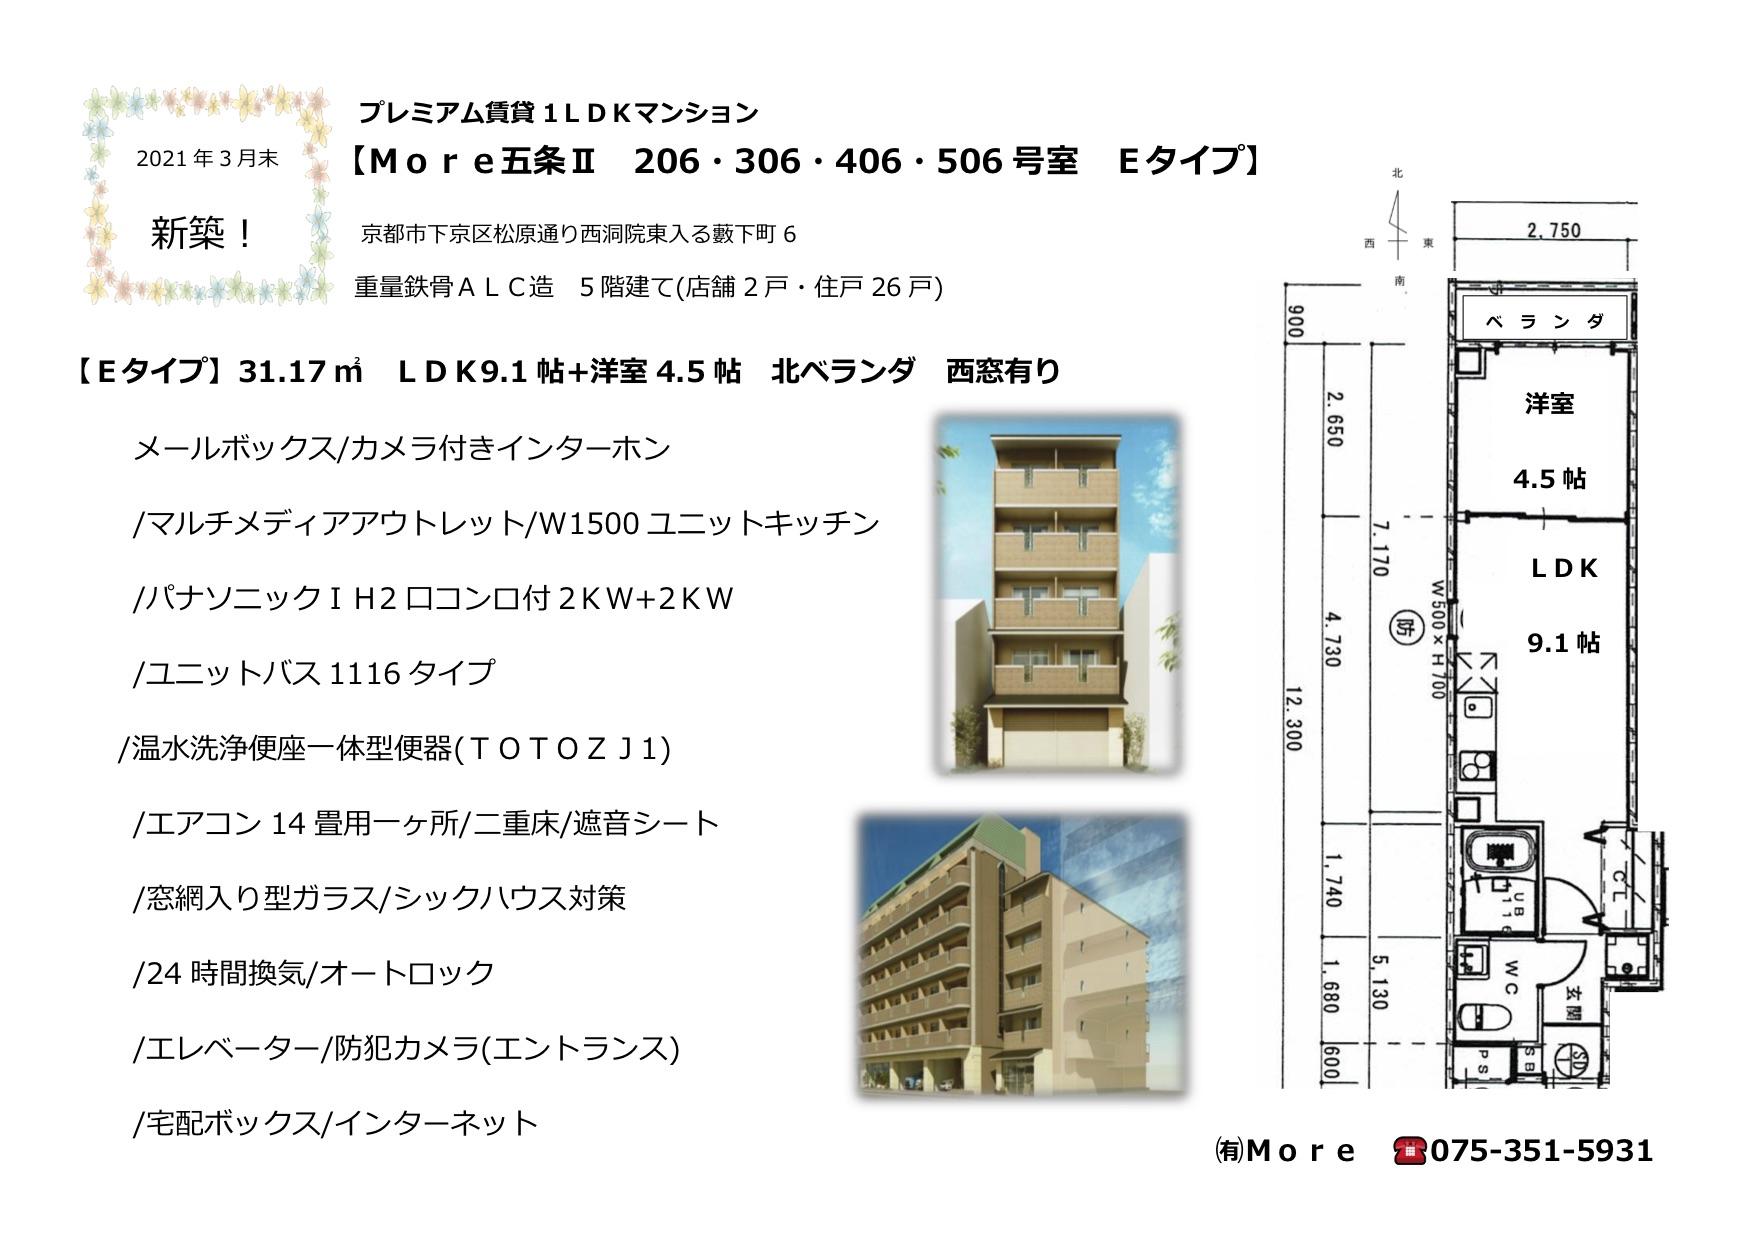 More五条Ⅱ 206・306・406・506号室